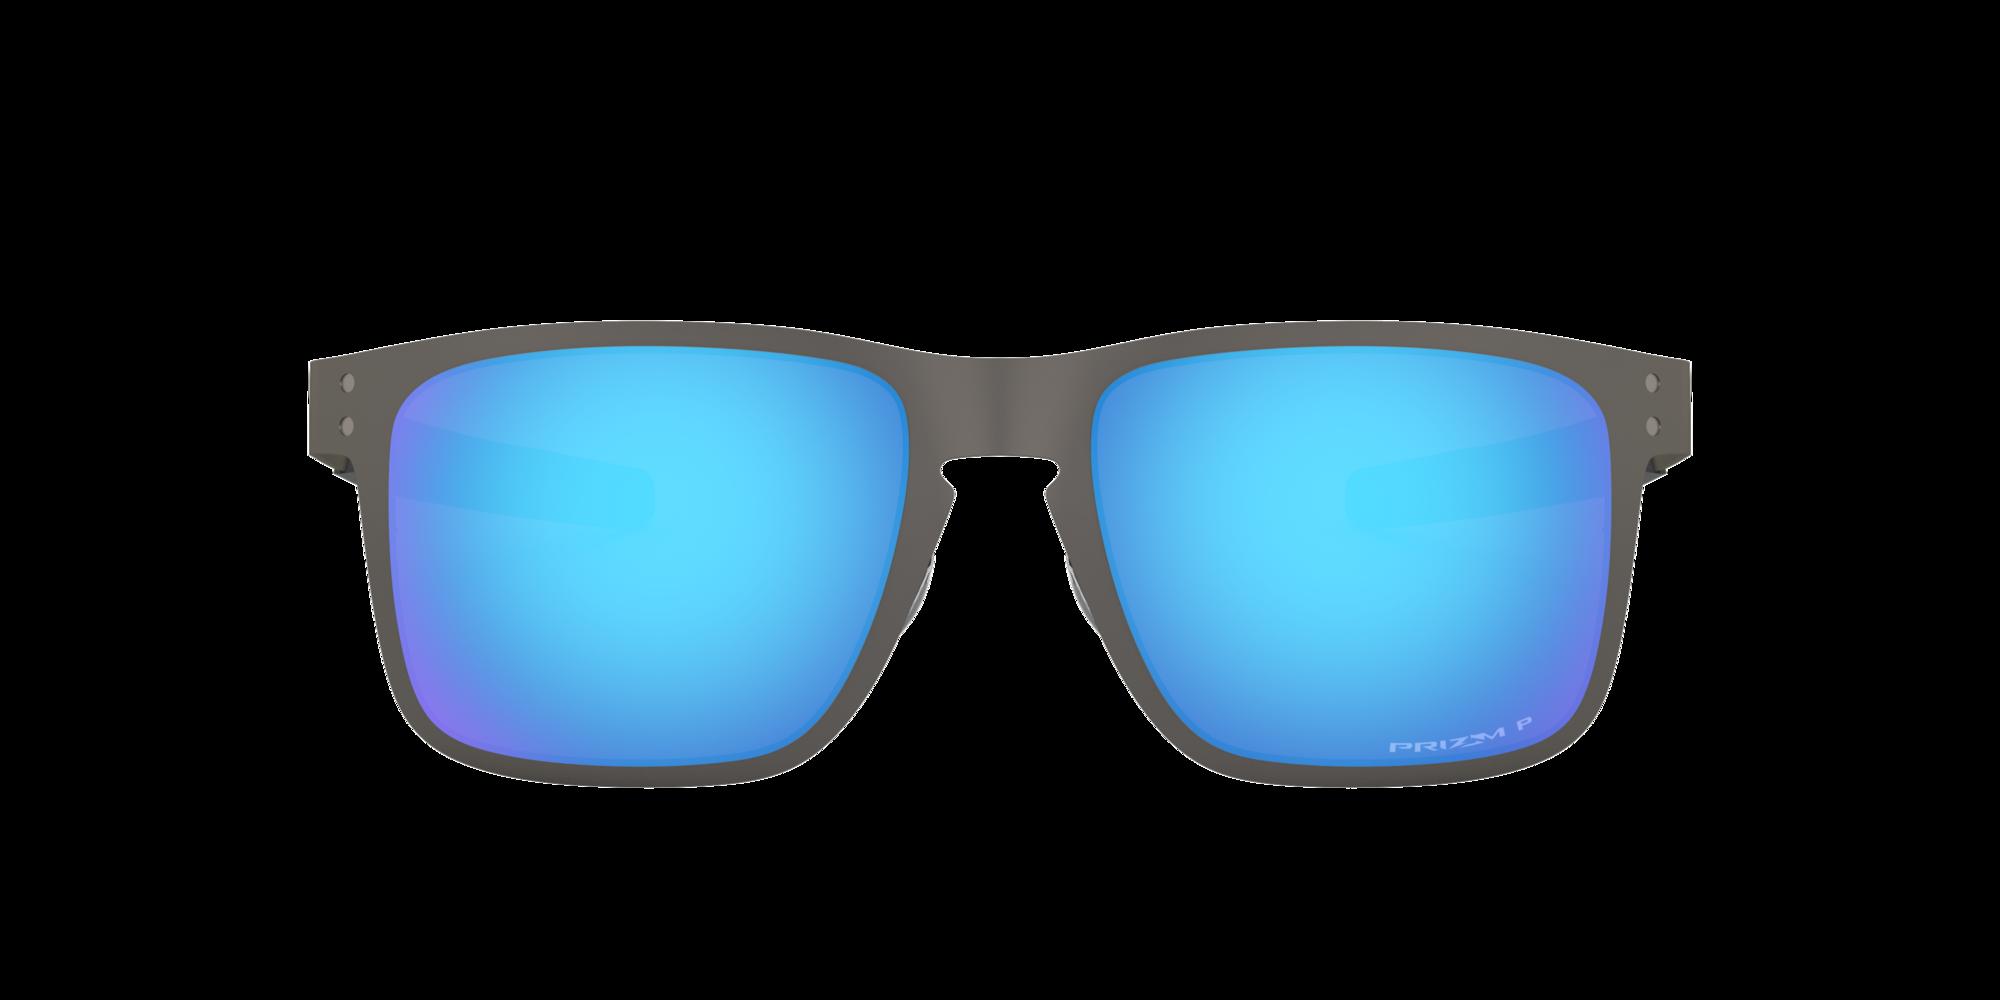 Image for OO4123 55 Holbrook Metal from LensCrafters | Glasses, Prescription Glasses Online, Eyewear